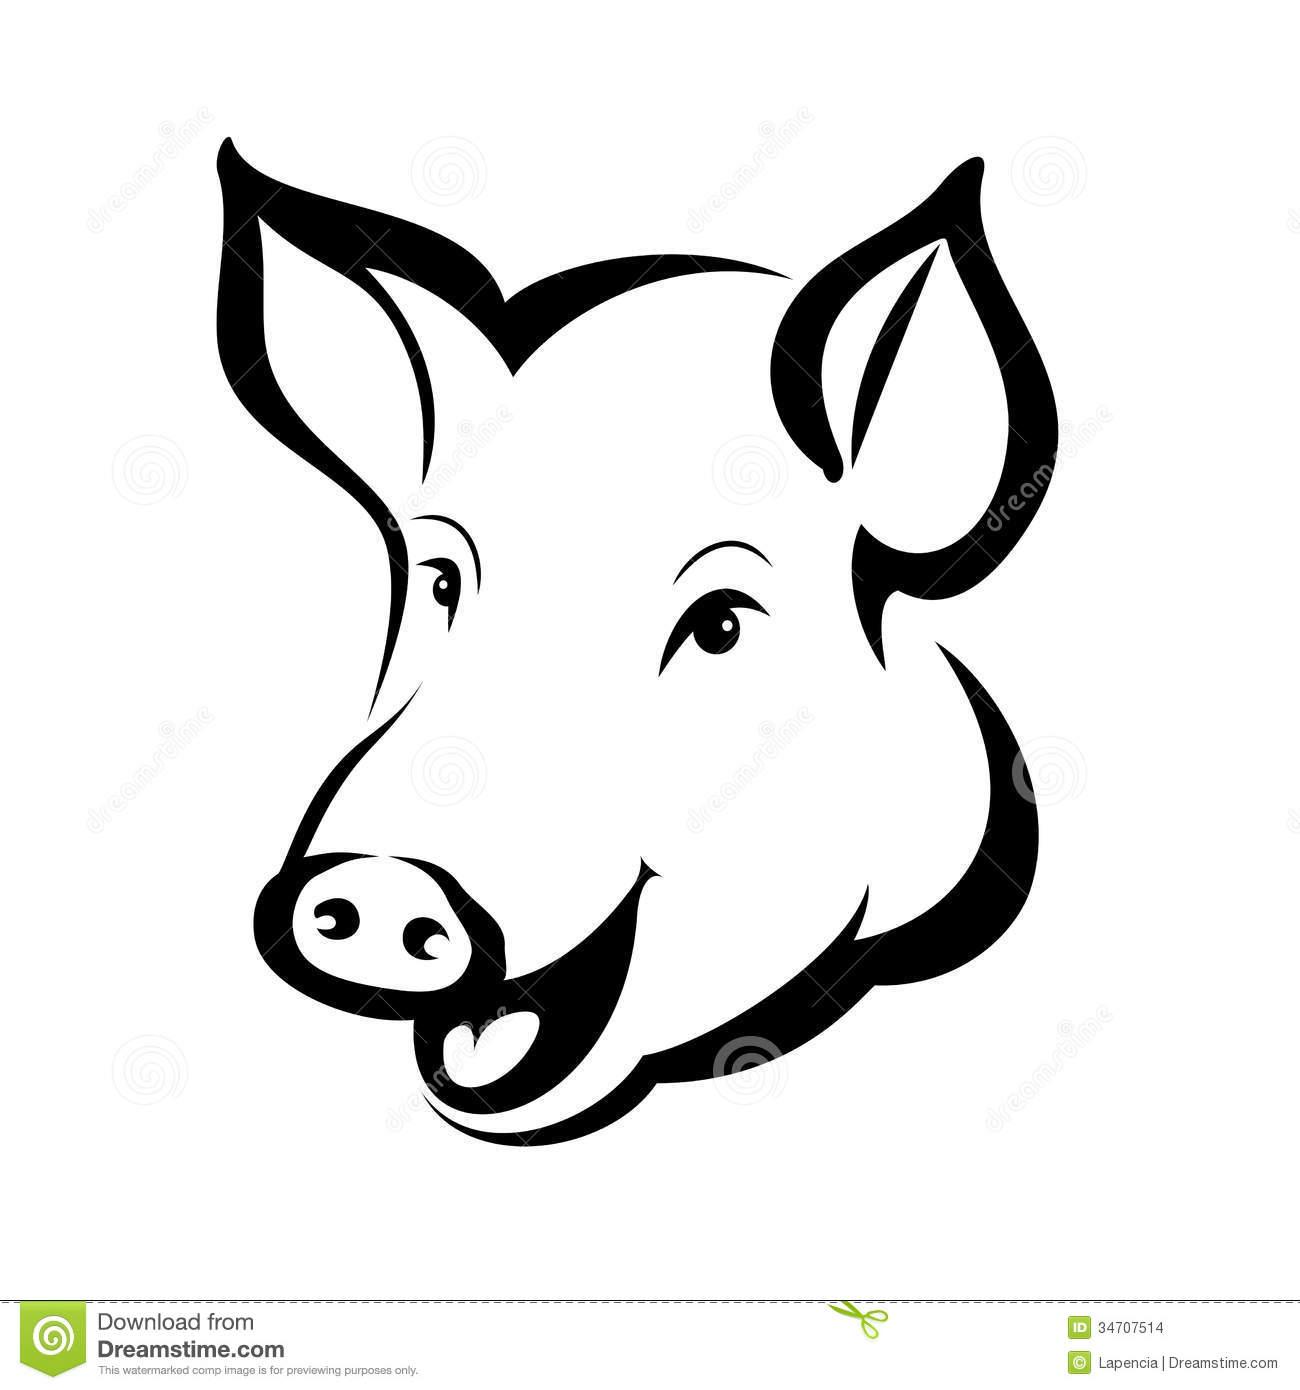 Pig head clip art.